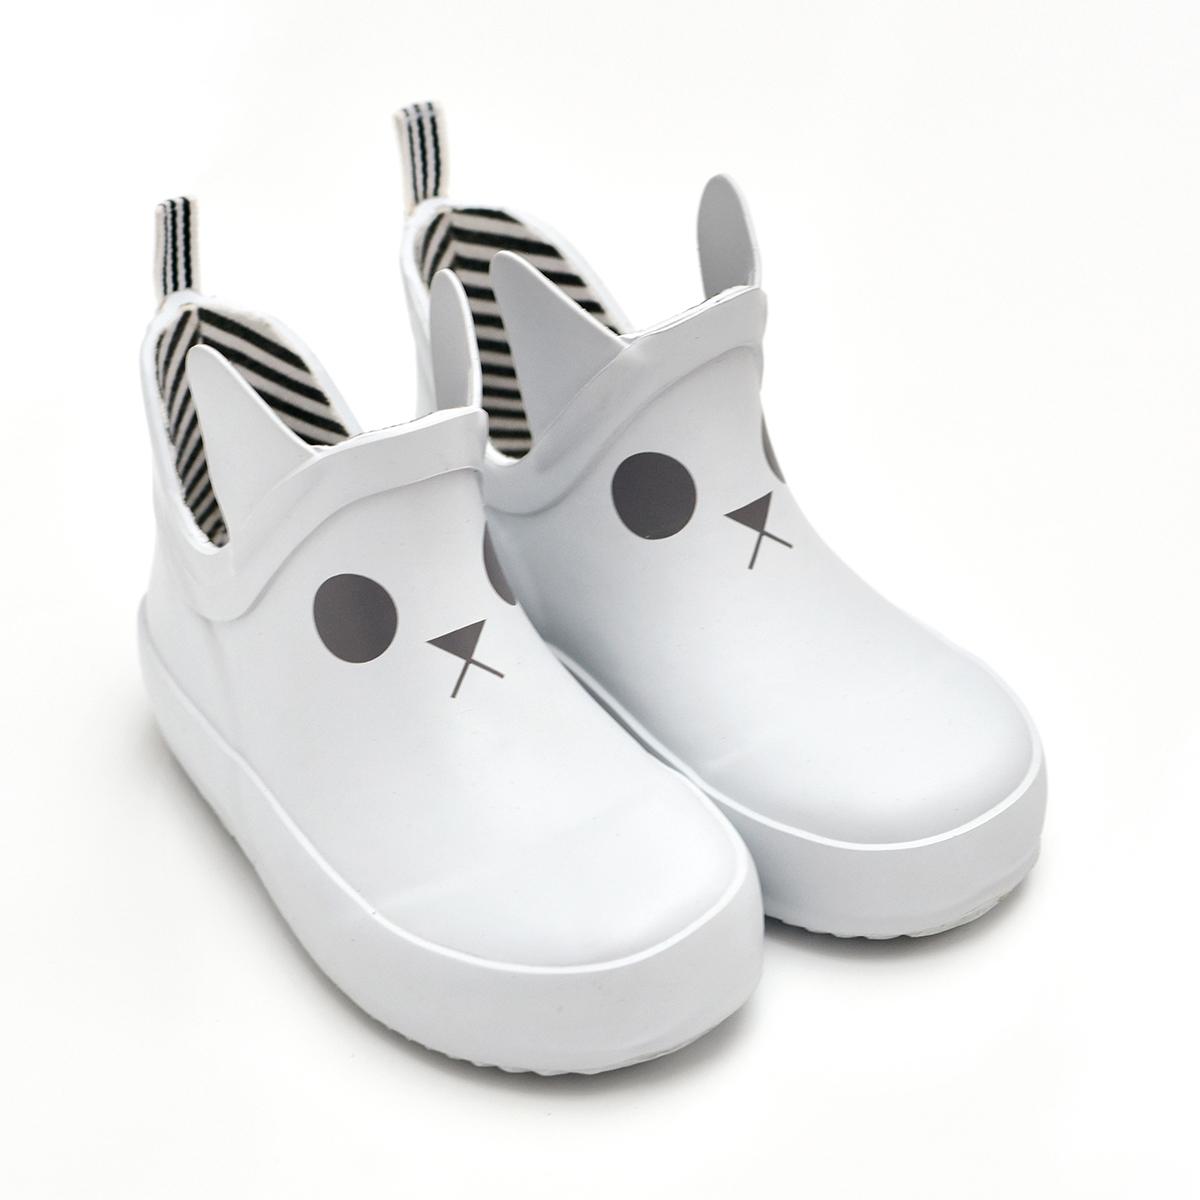 Chaussons & Chaussures Bottines Kerran Blanc - 25 Bottines Kerran Blanc - 25